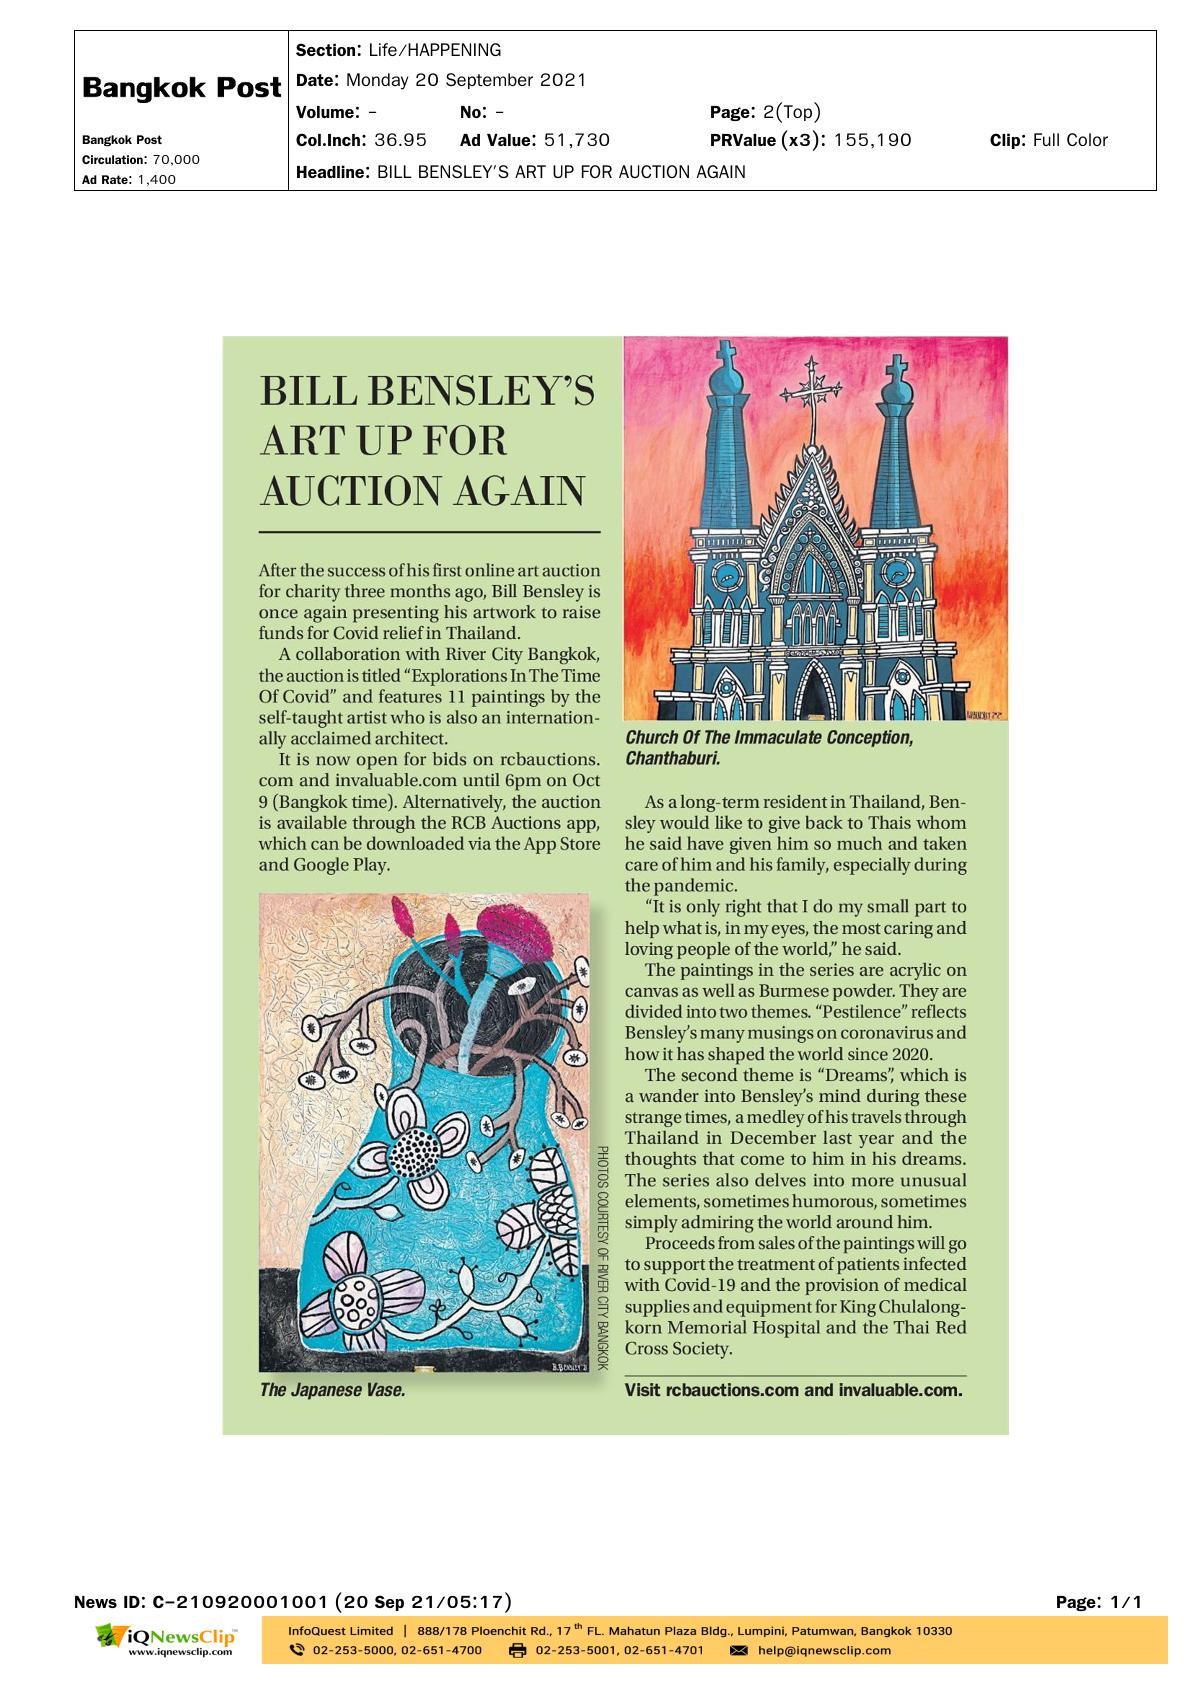 Bill Bensley's Art up for Auction Again